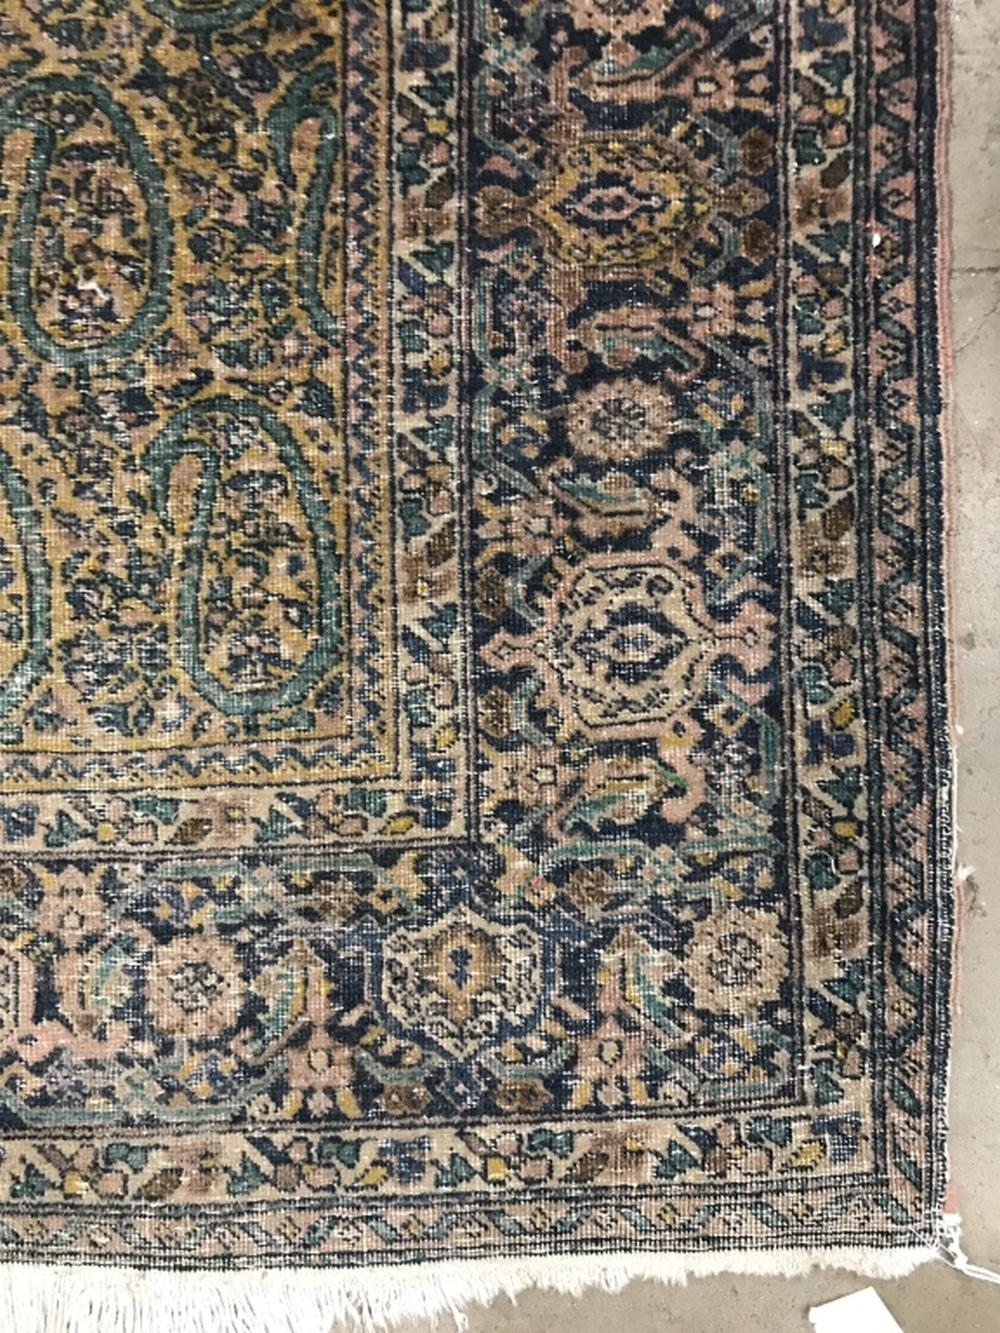 Antique Handmade Floral Detailed Wool Rug